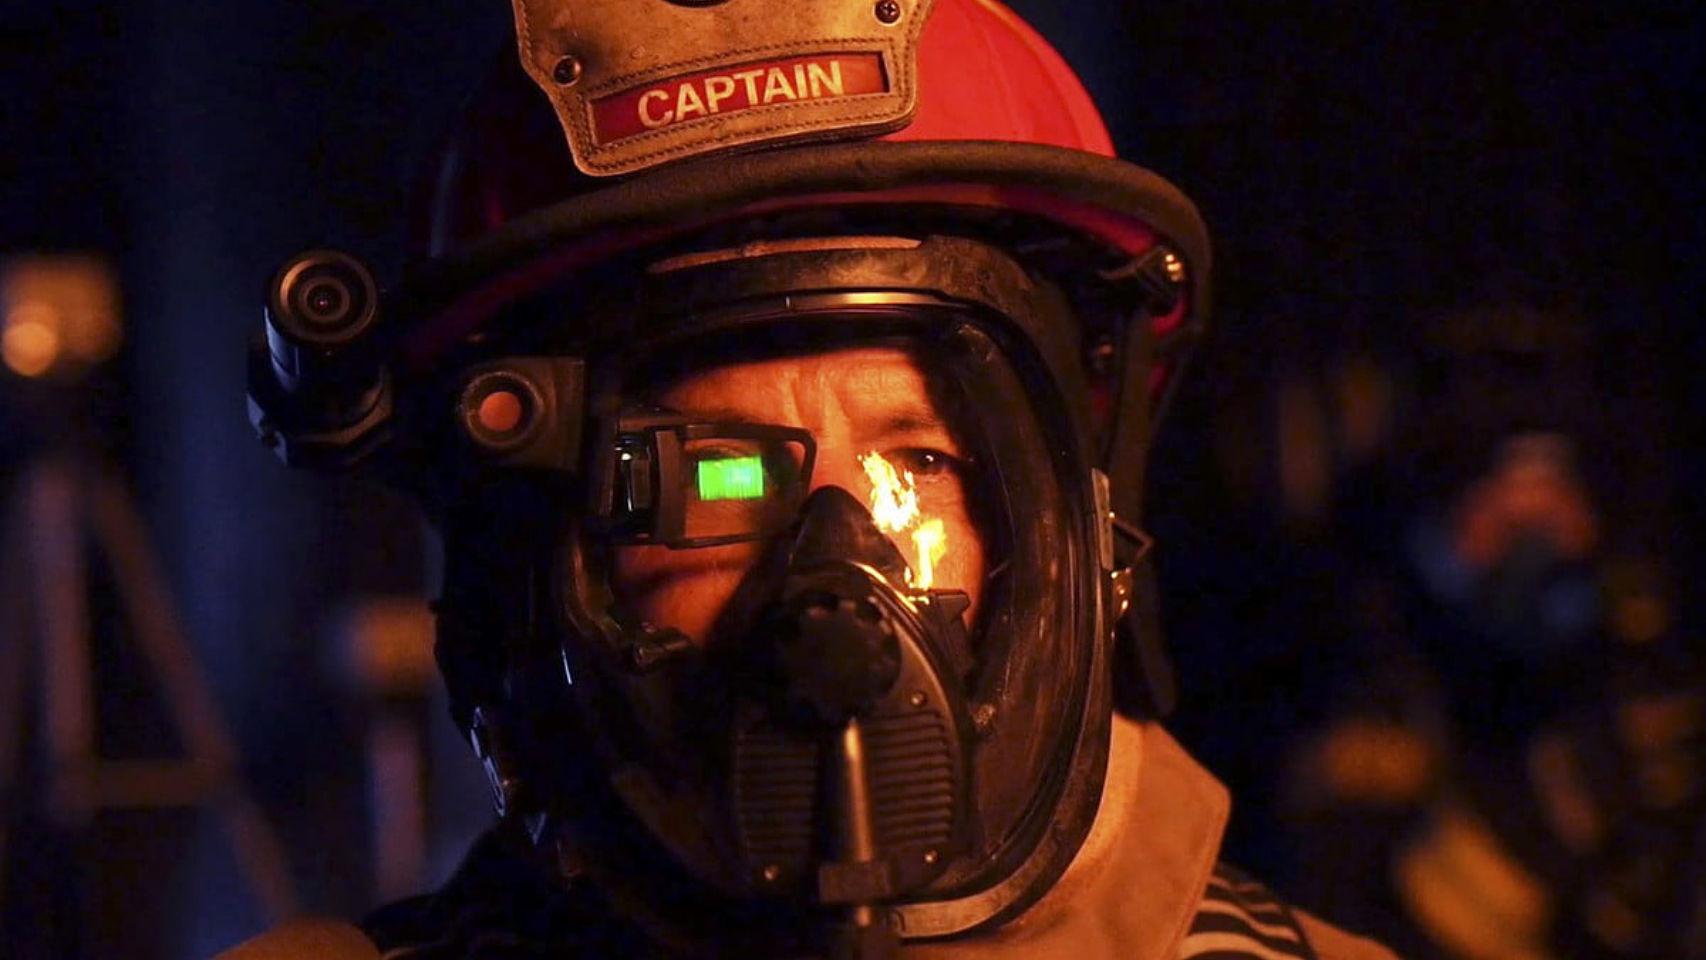 Casco de bomberos con realidad aumentada.